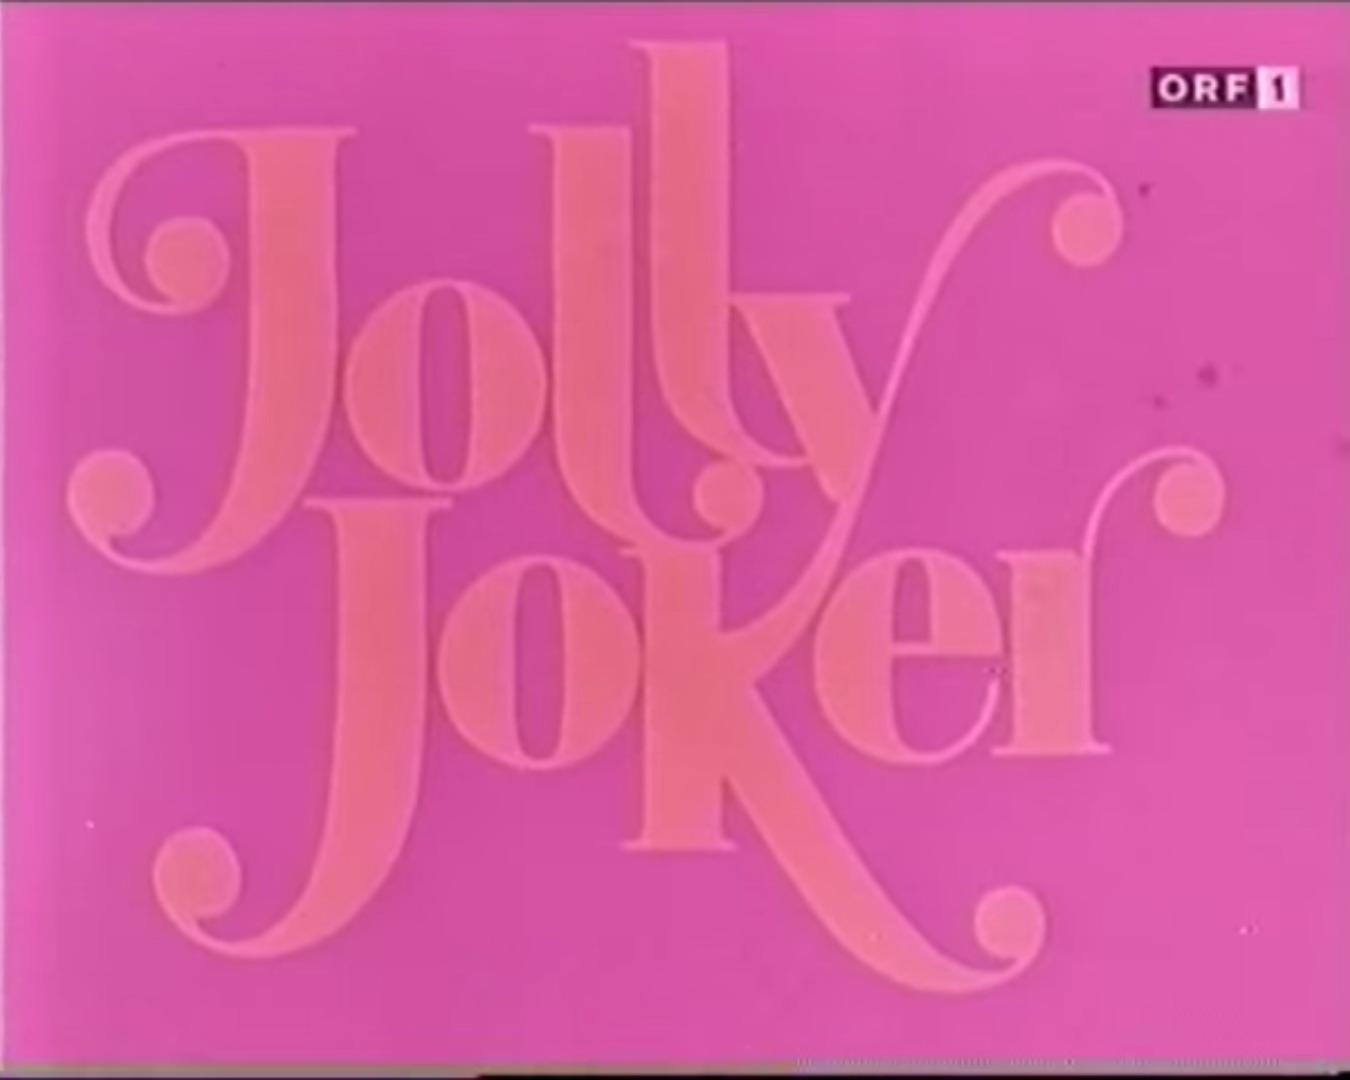 Jolly Joker (1980)